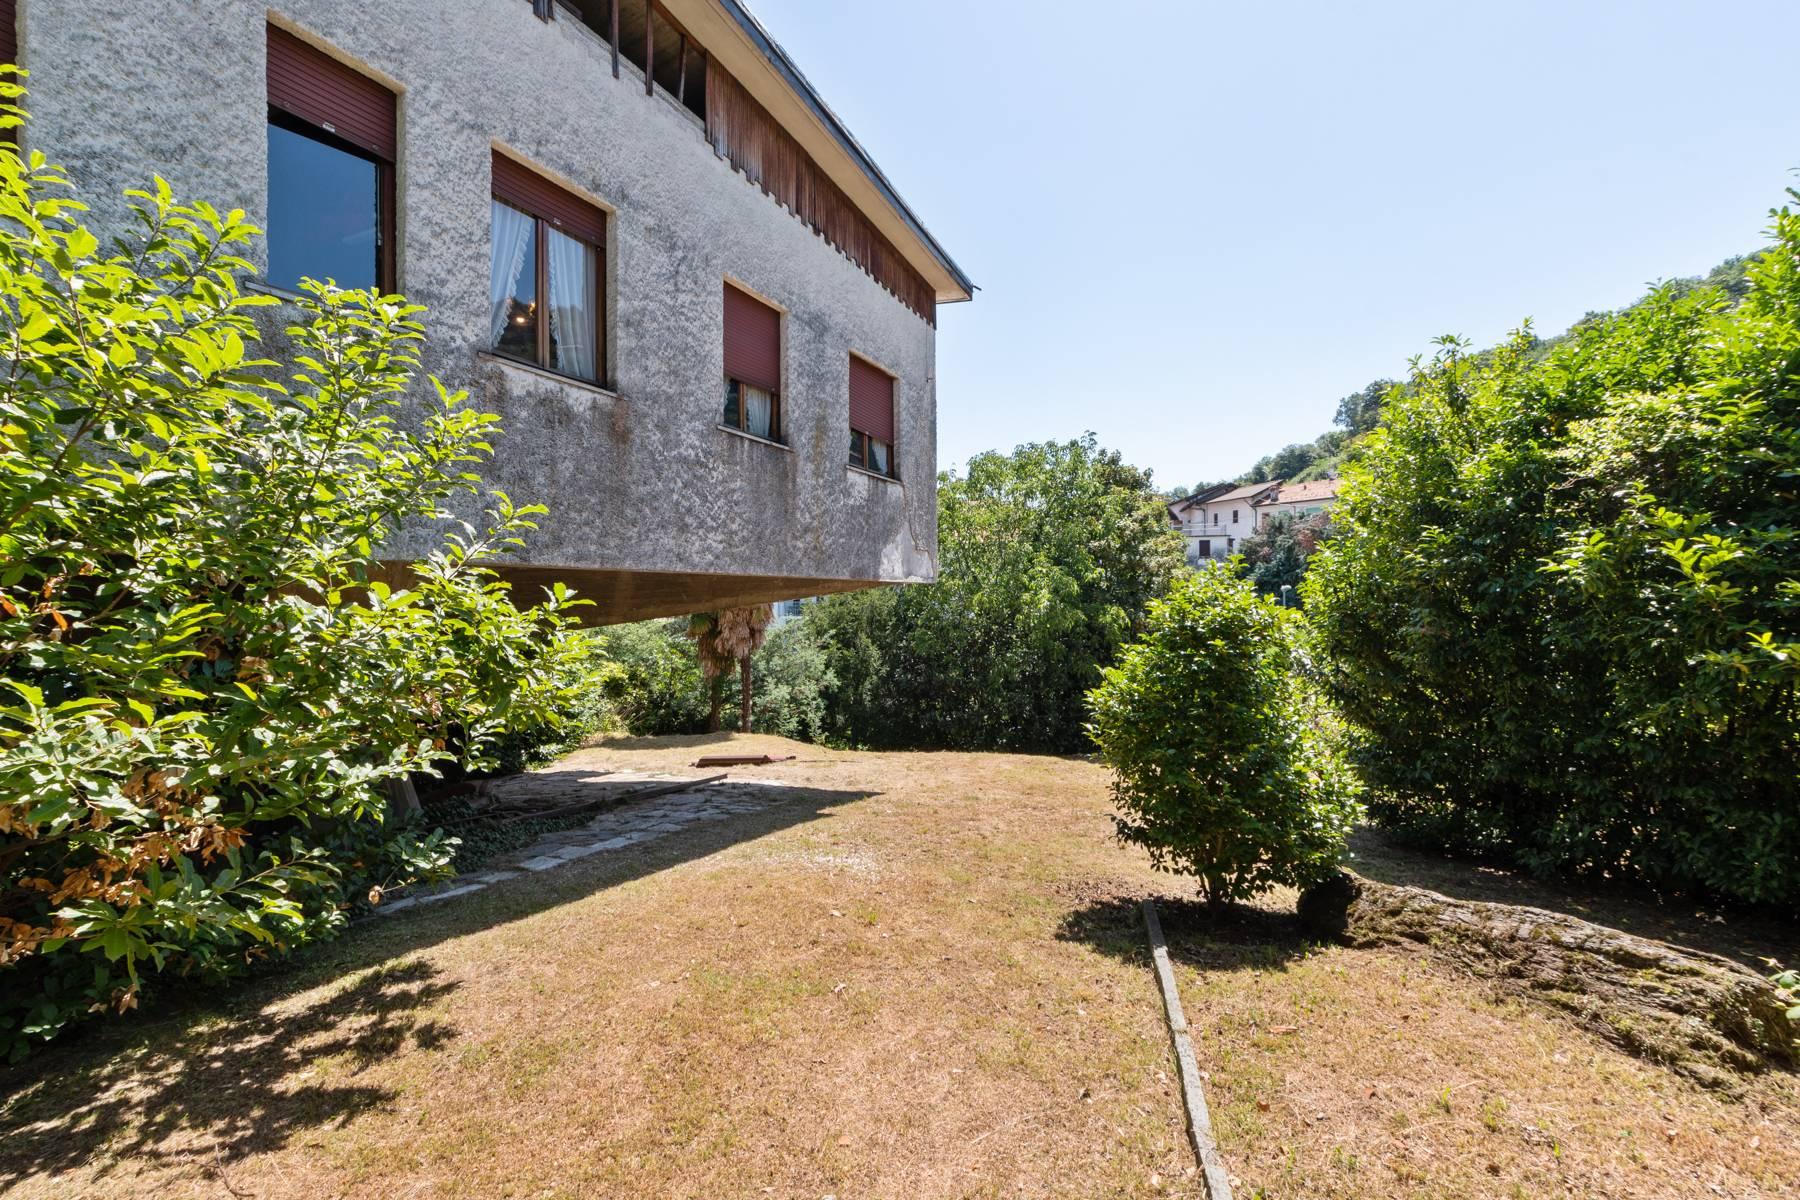 Villa in Vendita a Stresa: 5 locali, 150 mq - Foto 5